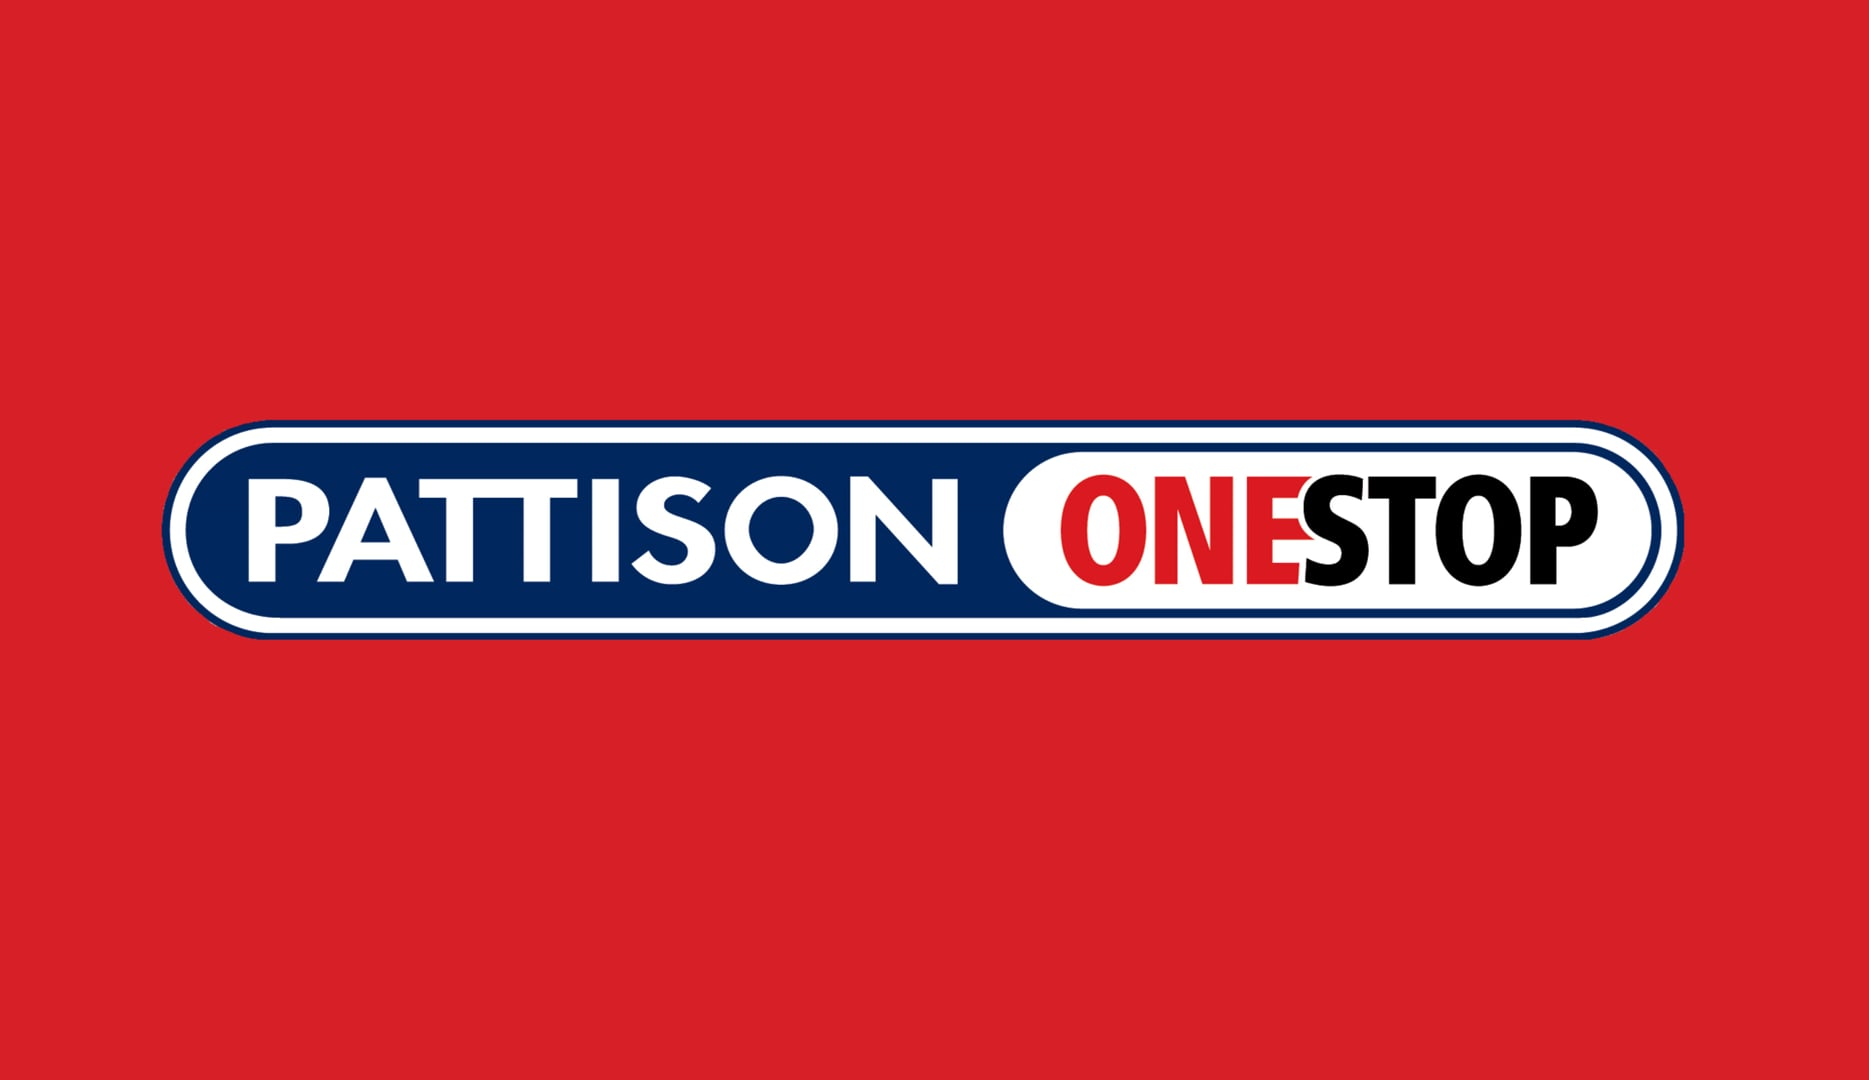 PATTISON Onestop